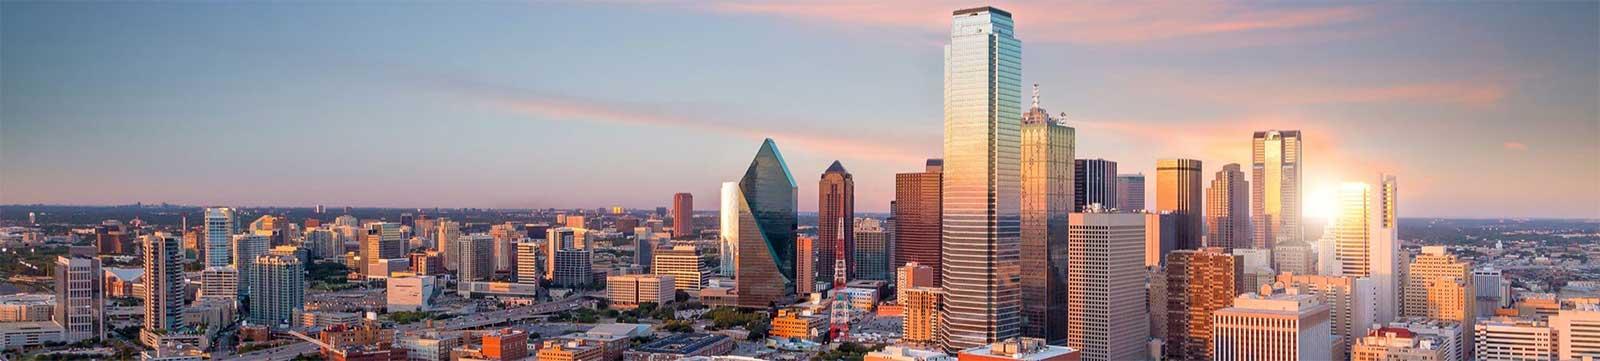 Stanley Automotive Finance Enterprise Dallas